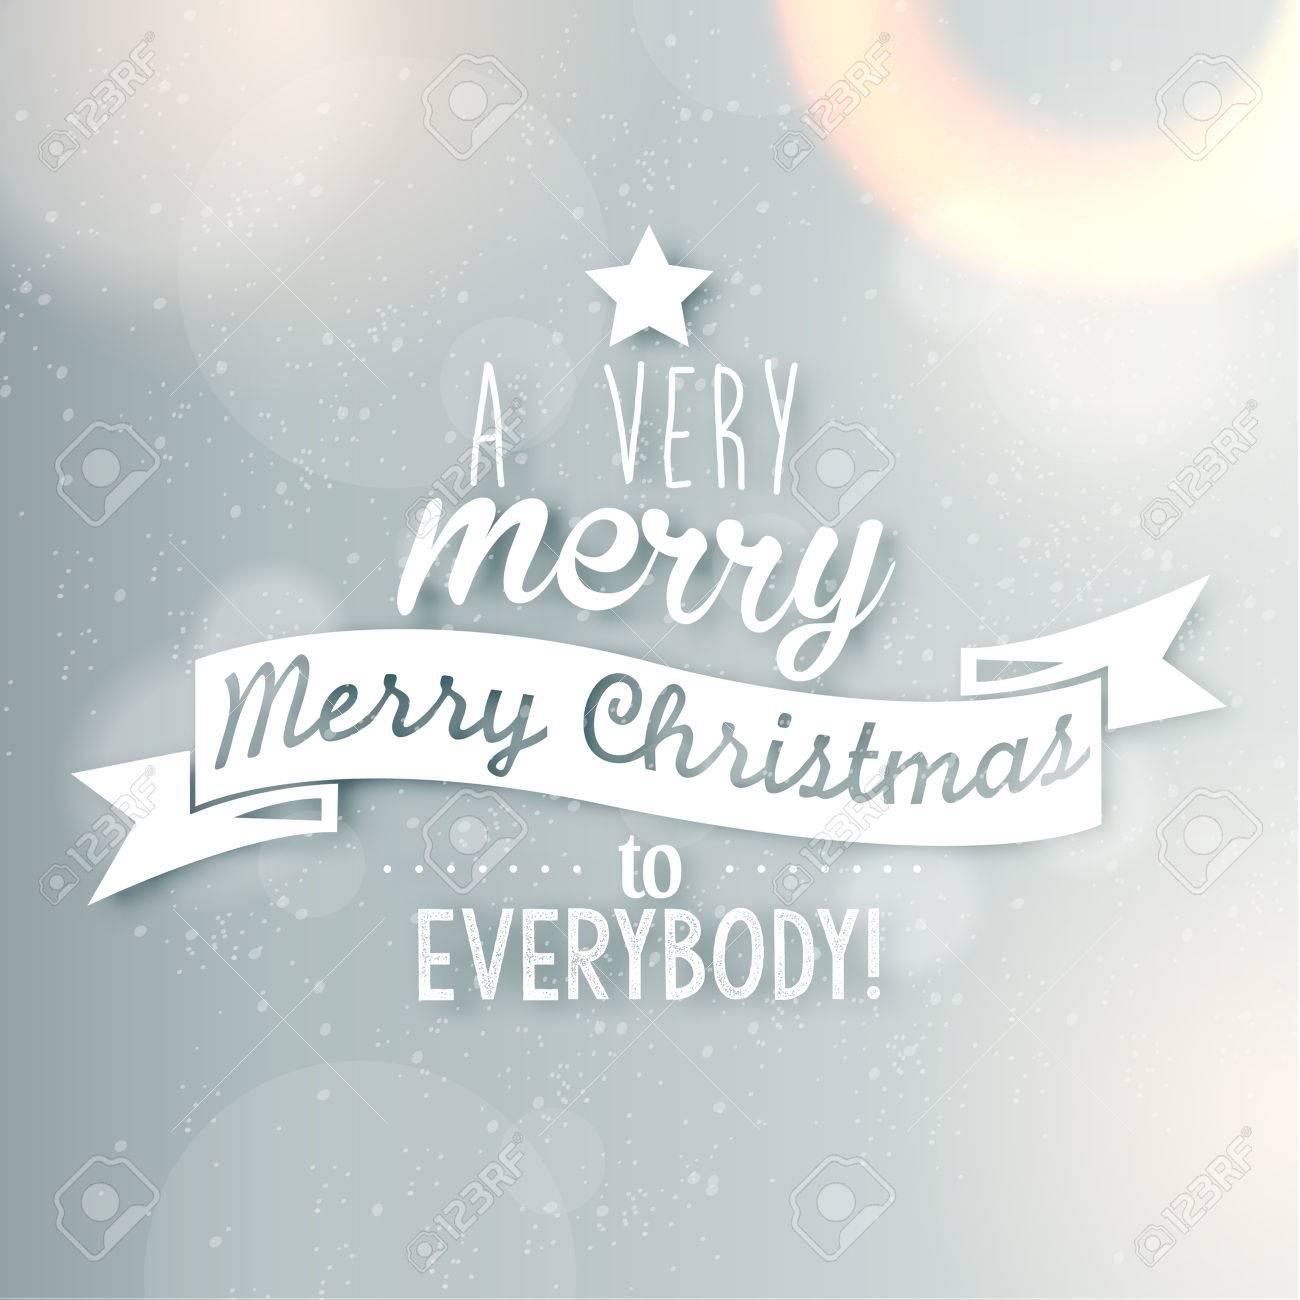 Merry christmas season greetings quote vector design royalty free merry christmas season greetings quote vector design stock vector 33533143 kristyandbryce Choice Image